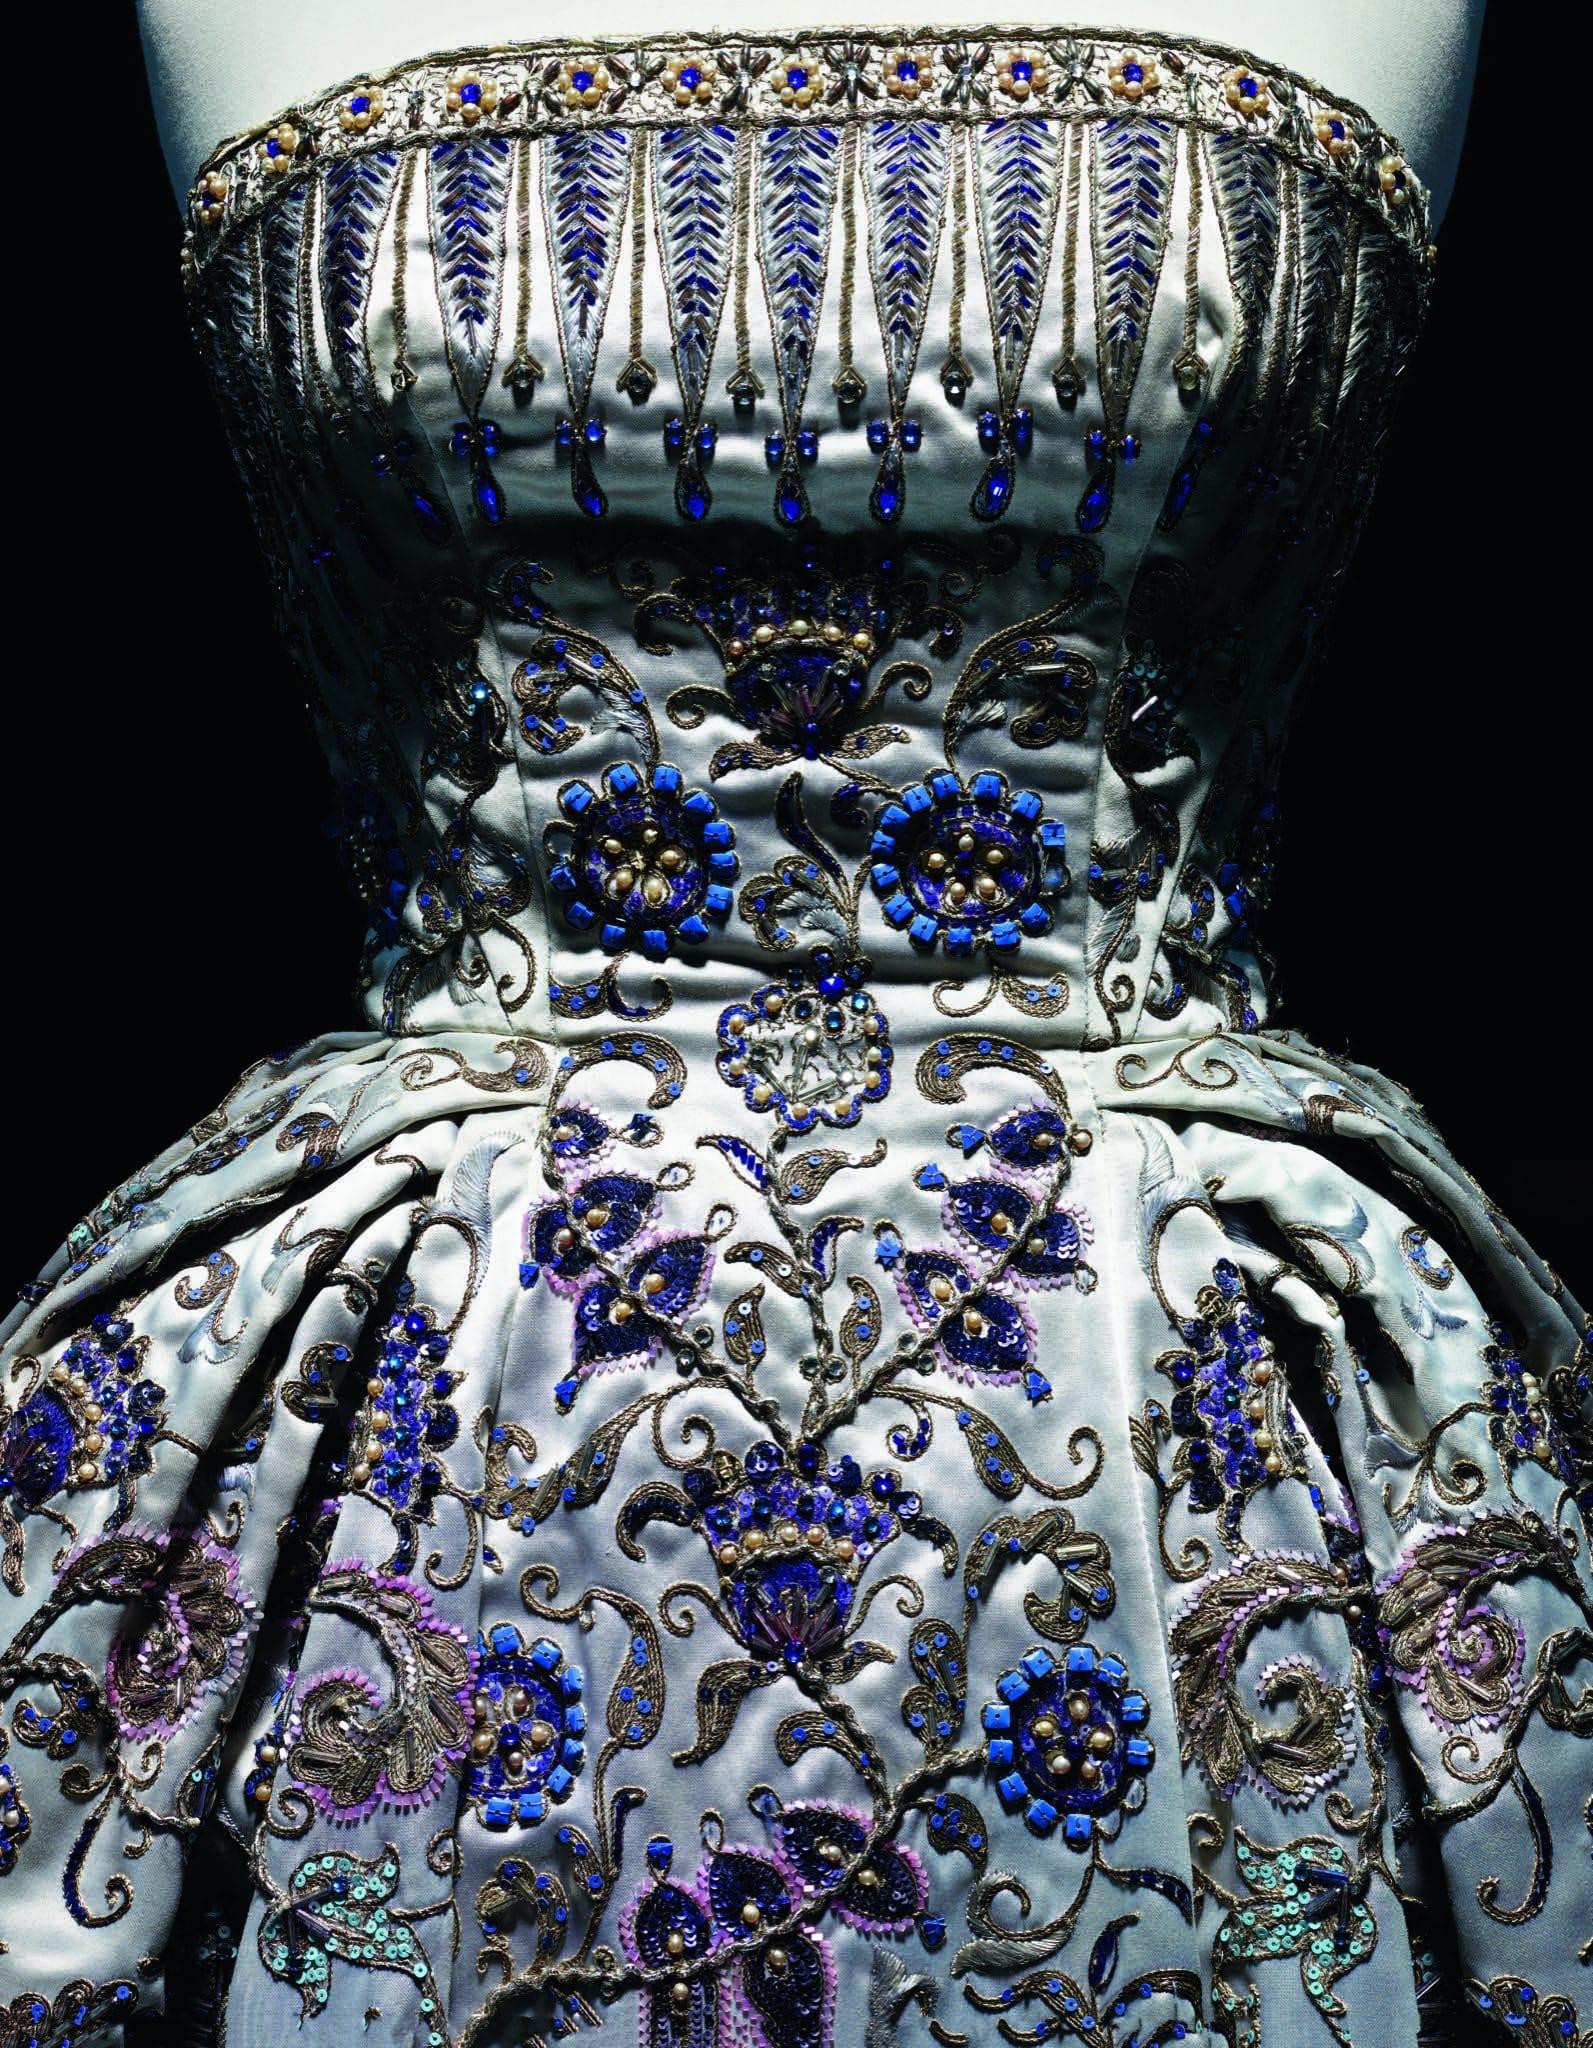 Christian Dior, couturier du rêve image 1